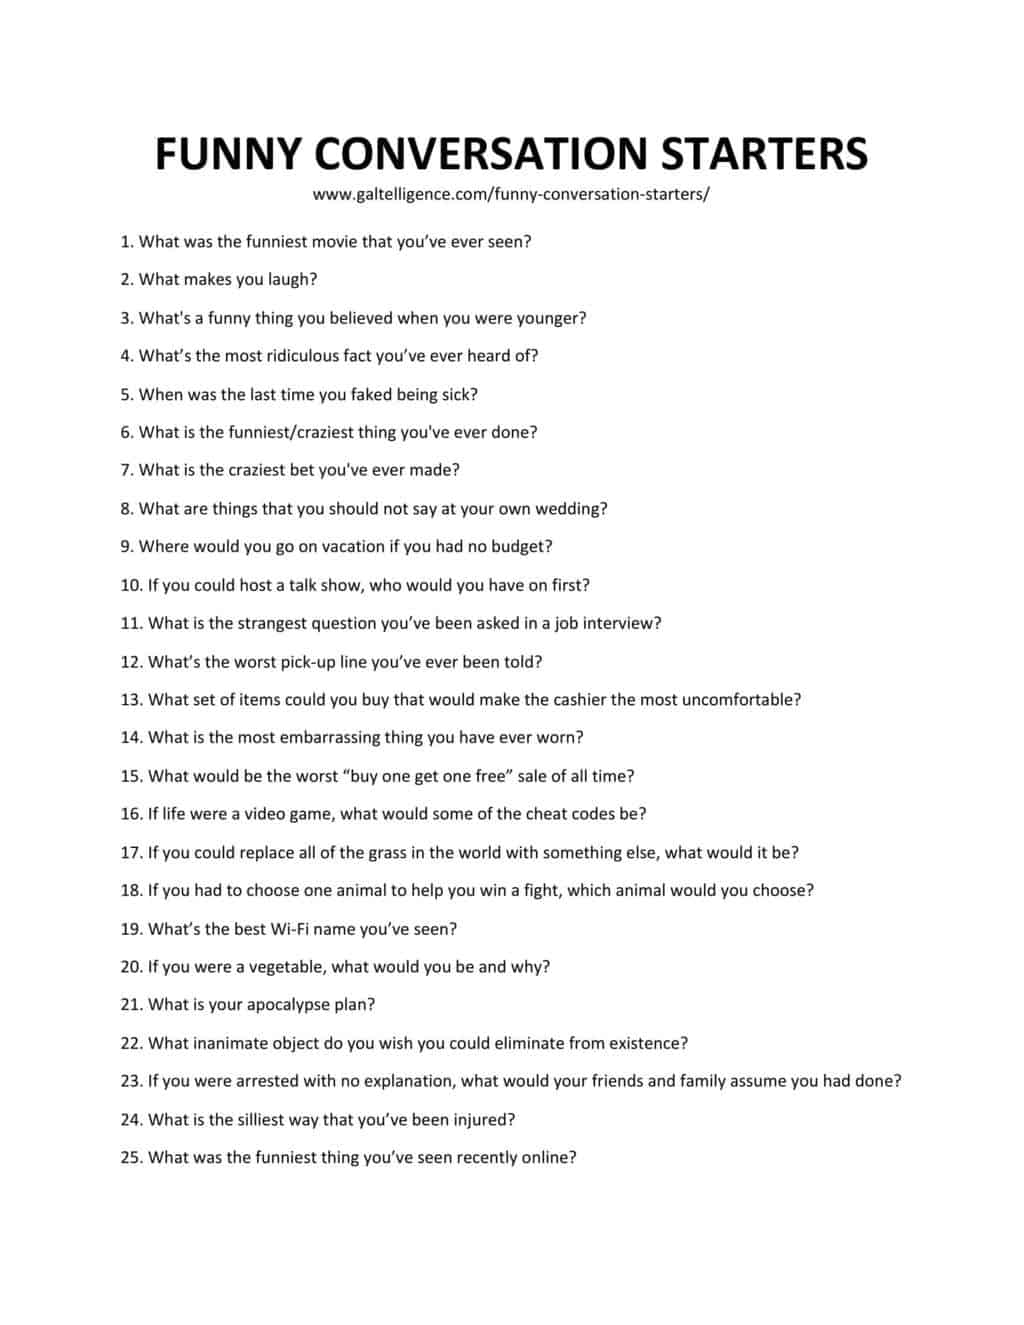 Downloadable list of conversation starters